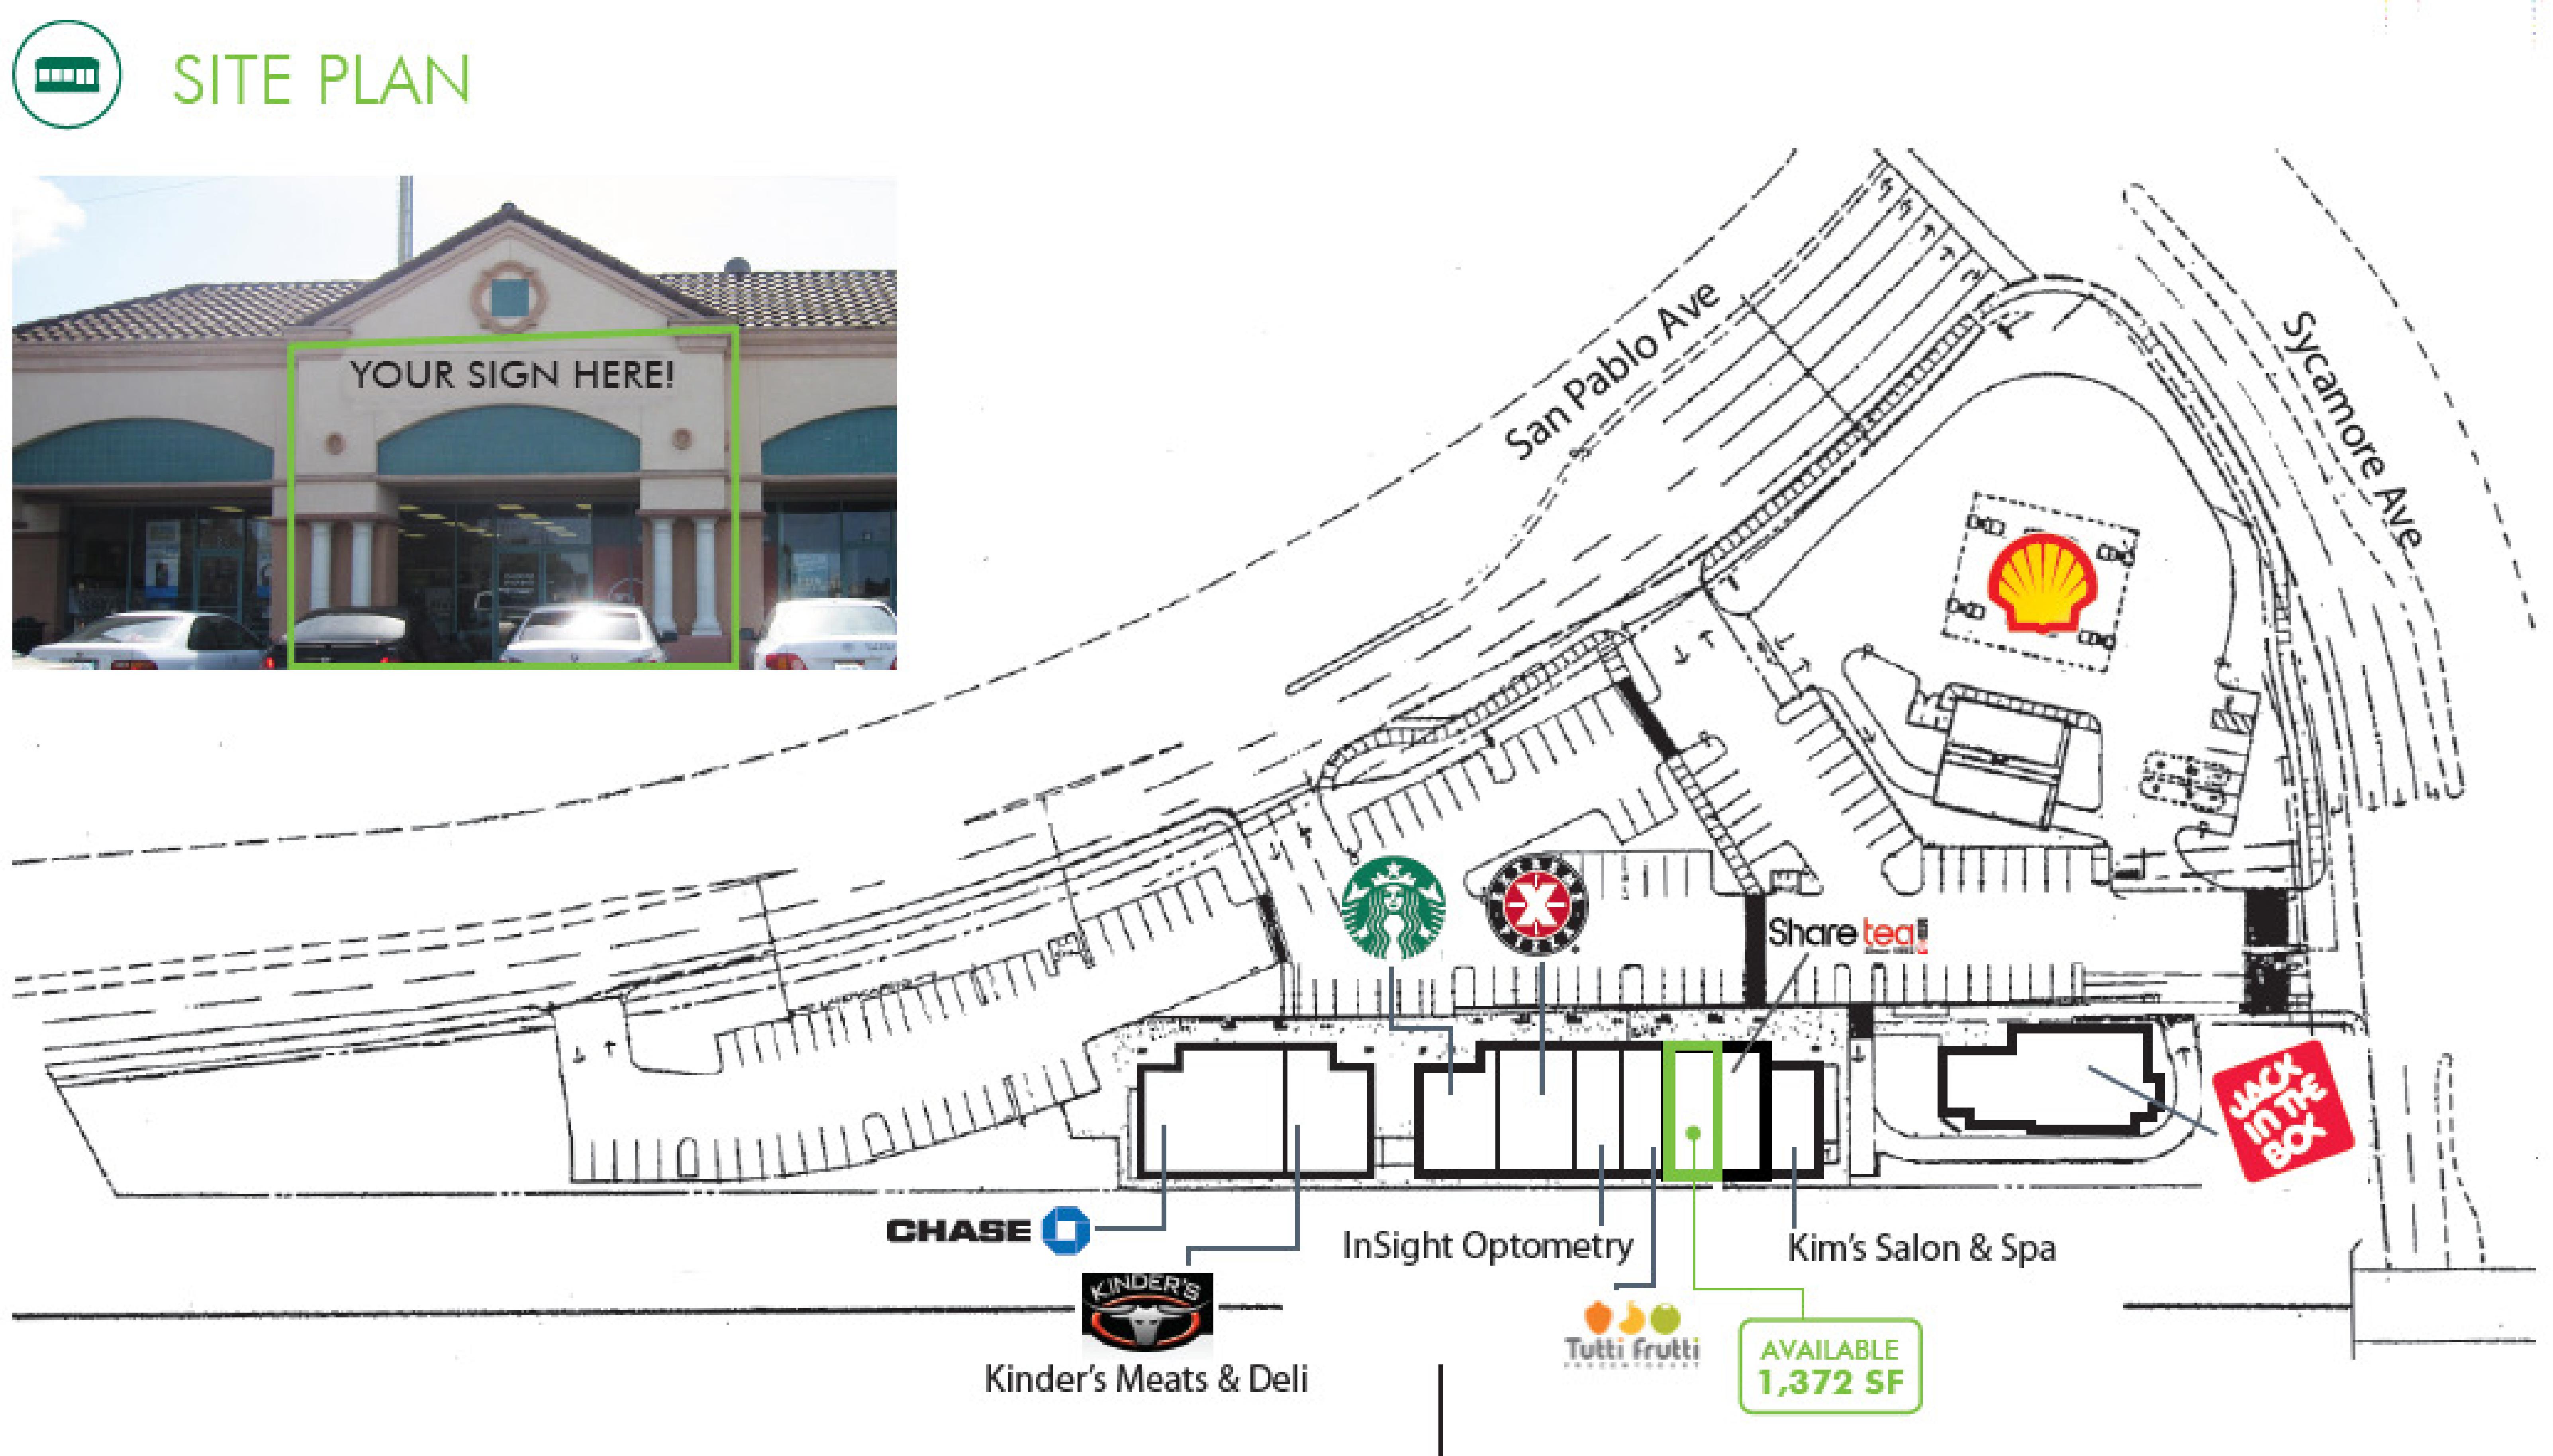 Hercules Retail Center: site plan